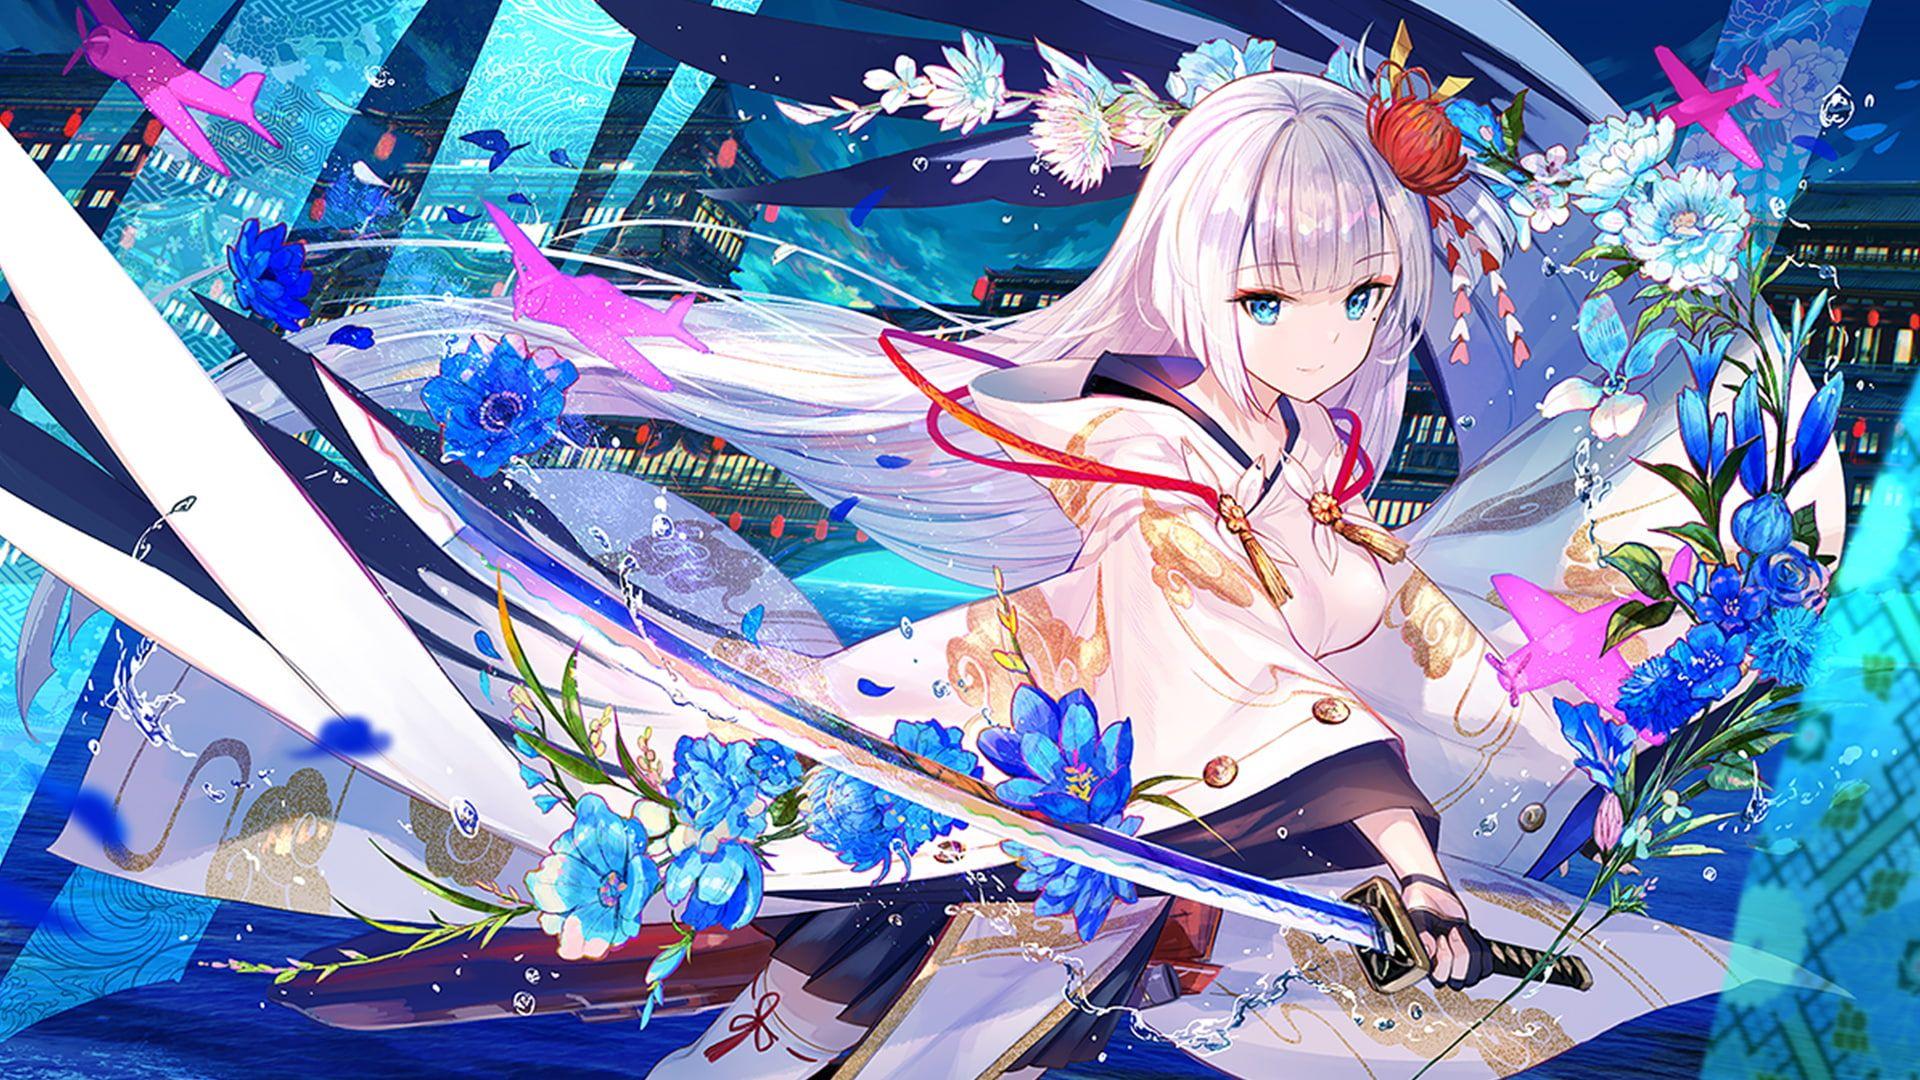 Anime Azur Lane Girl Shoukaku (Azur Lane) 1080P